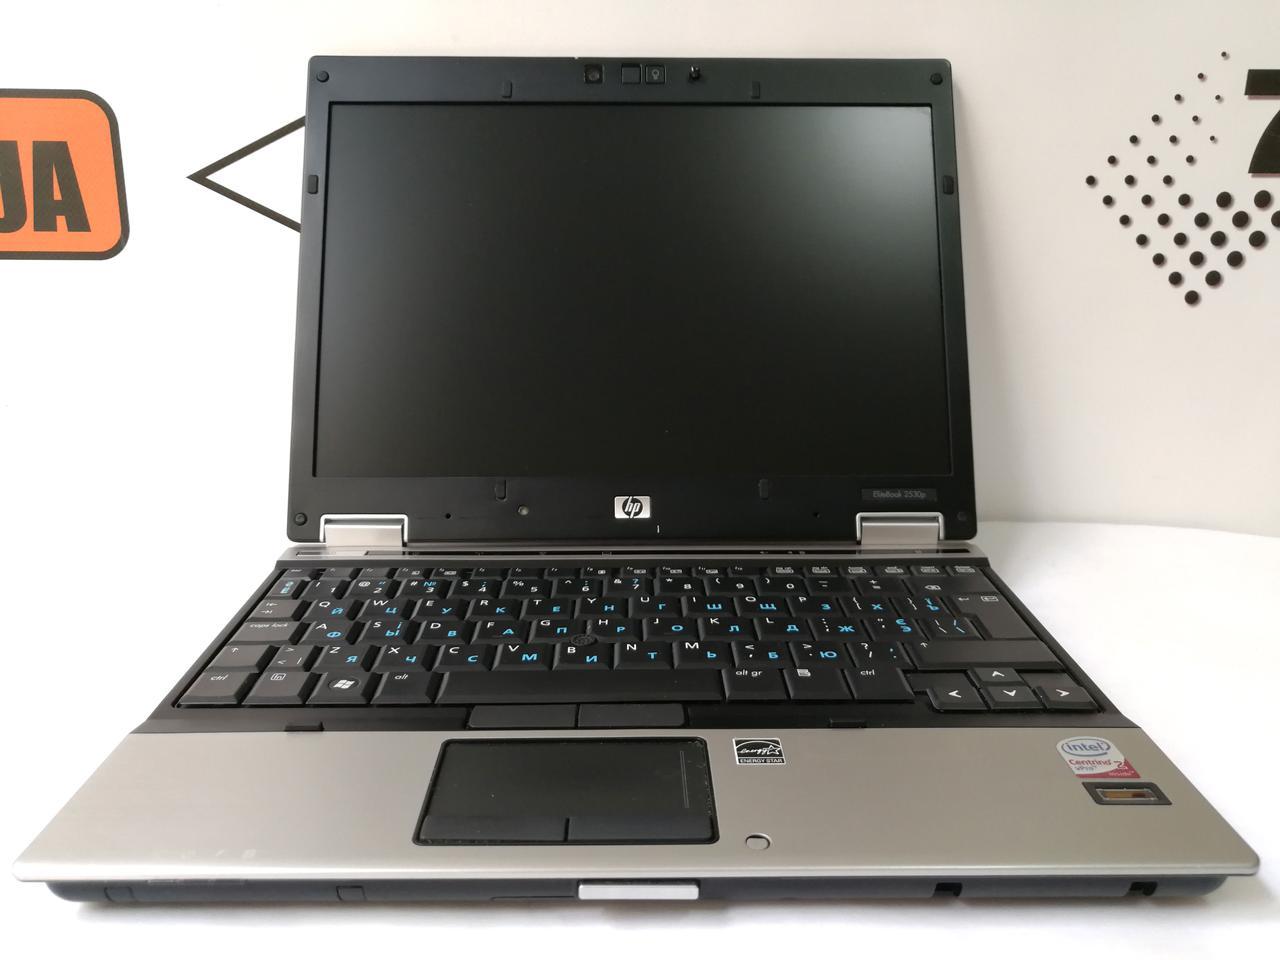 "Ноутбук HP EliteBook 2530p, 12.1"", Intel Core2Duo 1.86GHz, RAM 4ГБ, HDD 120ГБ"